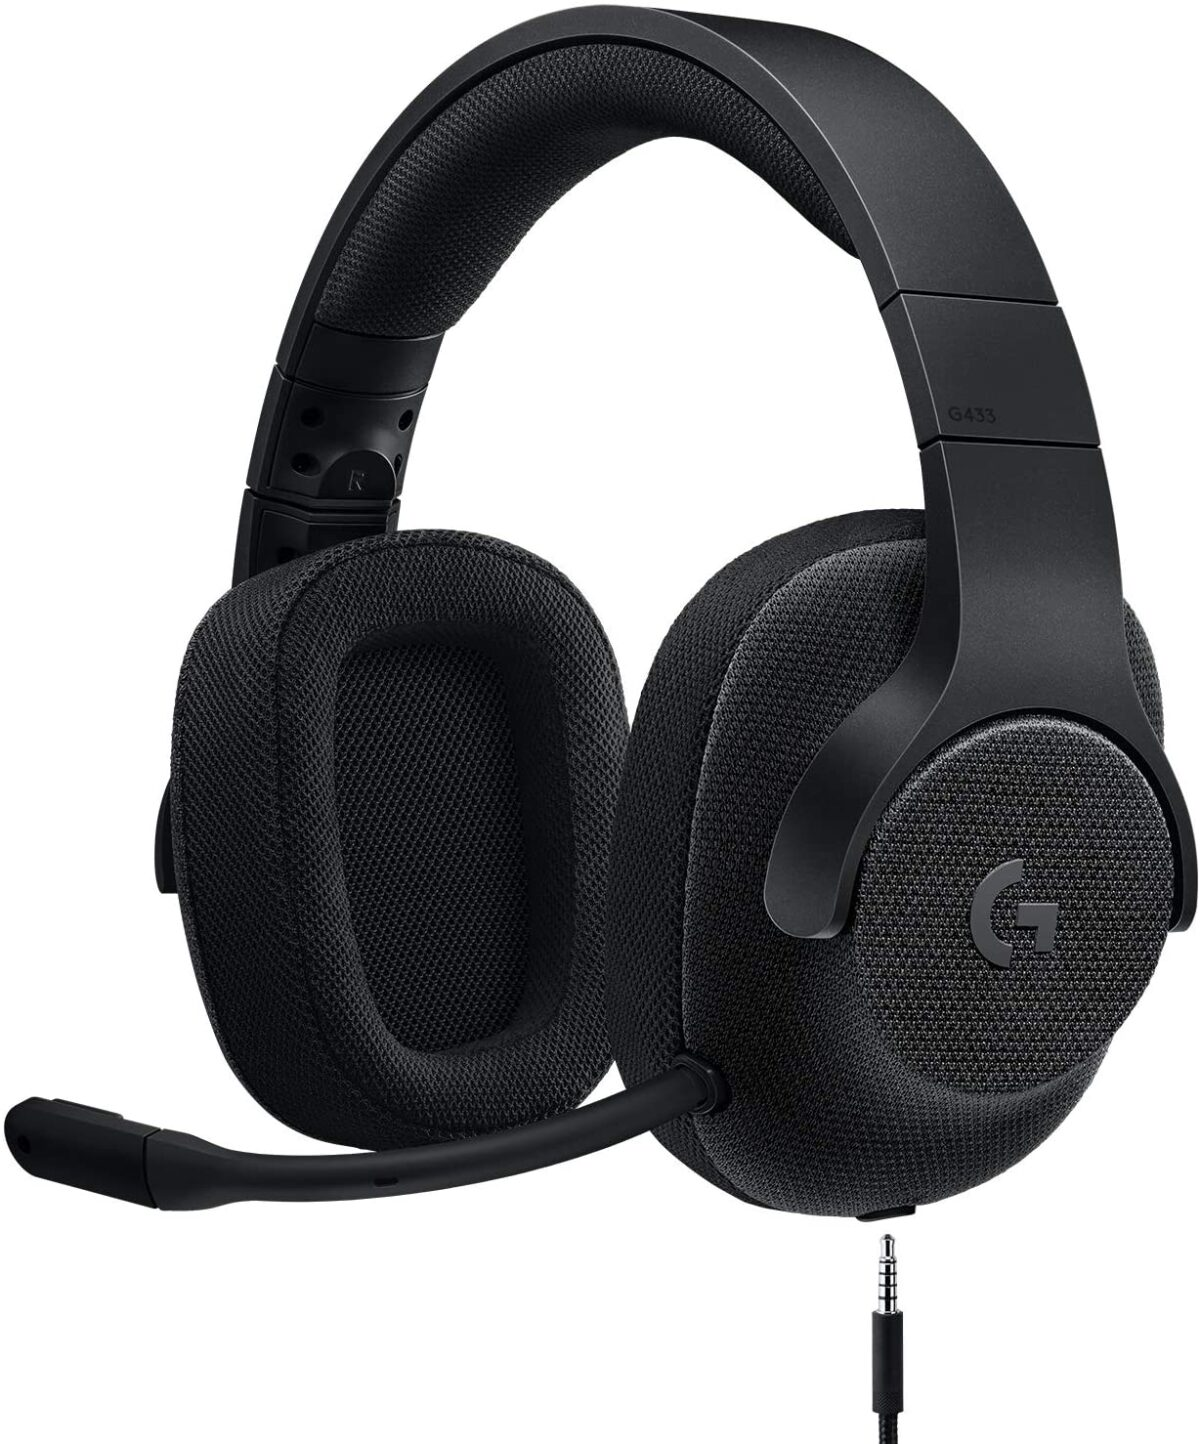 logitech g433 headset maroc